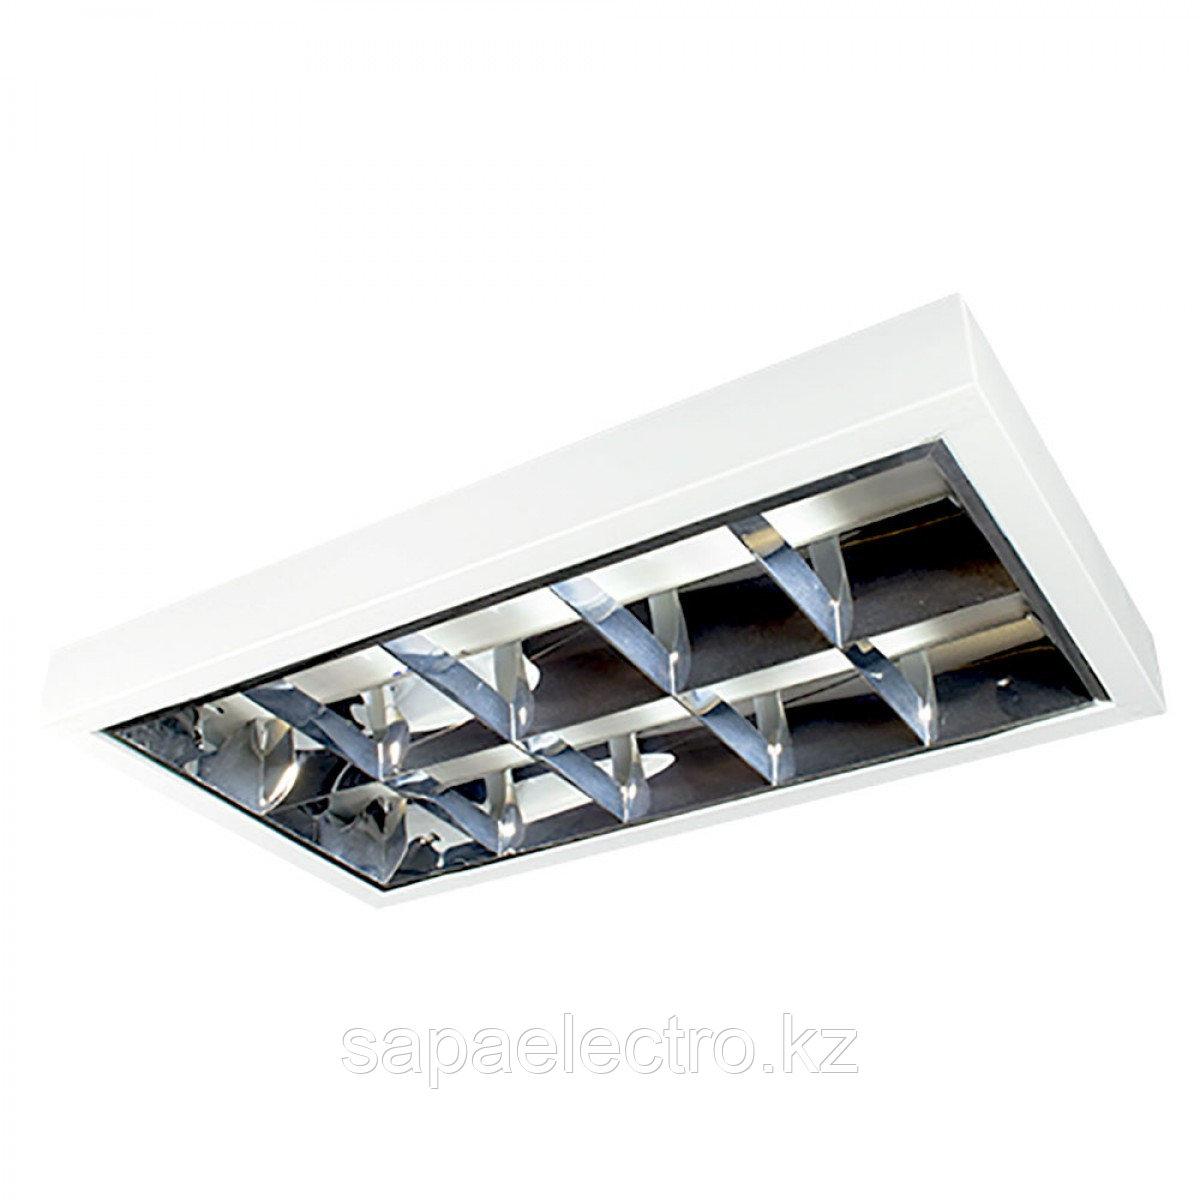 Св-к LEDTUBE LRN 2x9W/ 60см MODERNA (с лампой)MEGAL